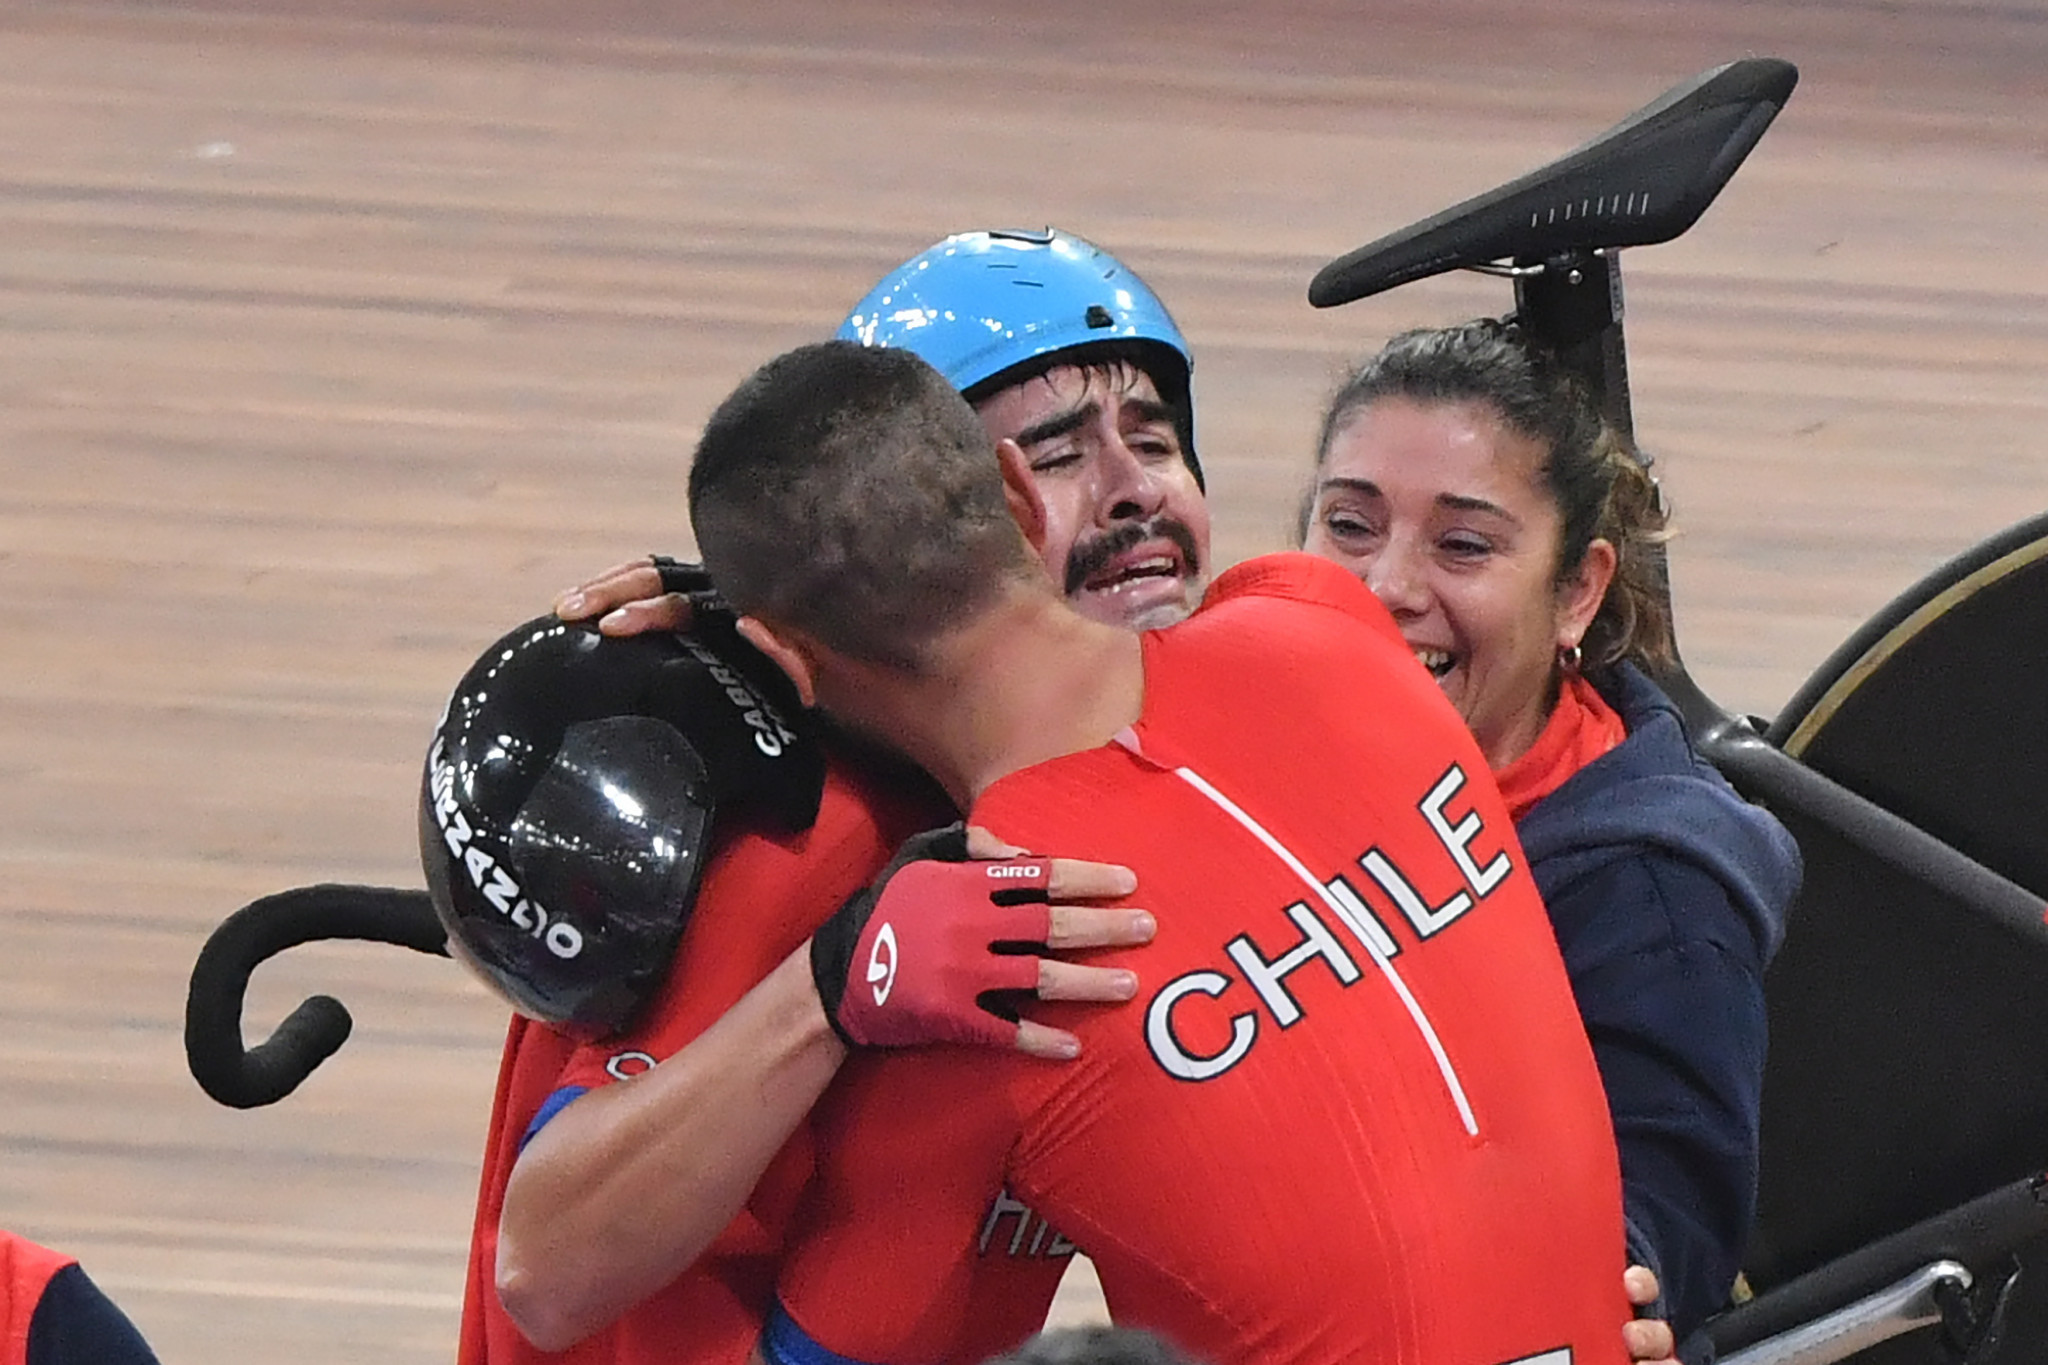 Chile's Antonio Cabrera Torres and Felipe Penaloza Yanez won the men's madison ©Getty Images